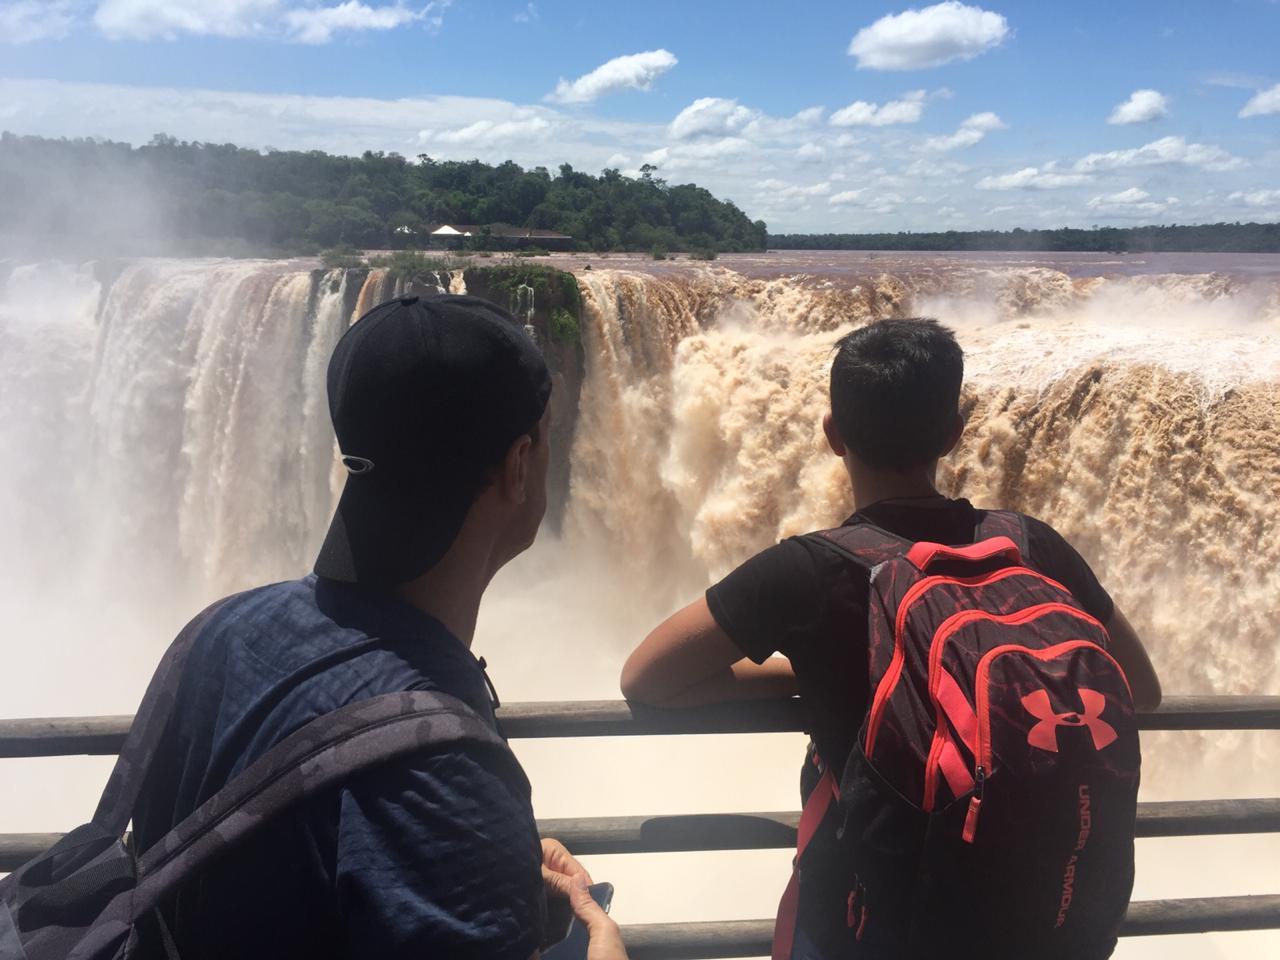 FOZ COMBO 3 - Arriving Foz do Iguaçu | Staying in Foz do Iguaçu | Brazilian + Argentine Side of Falls | Departing Puerto Iguazu